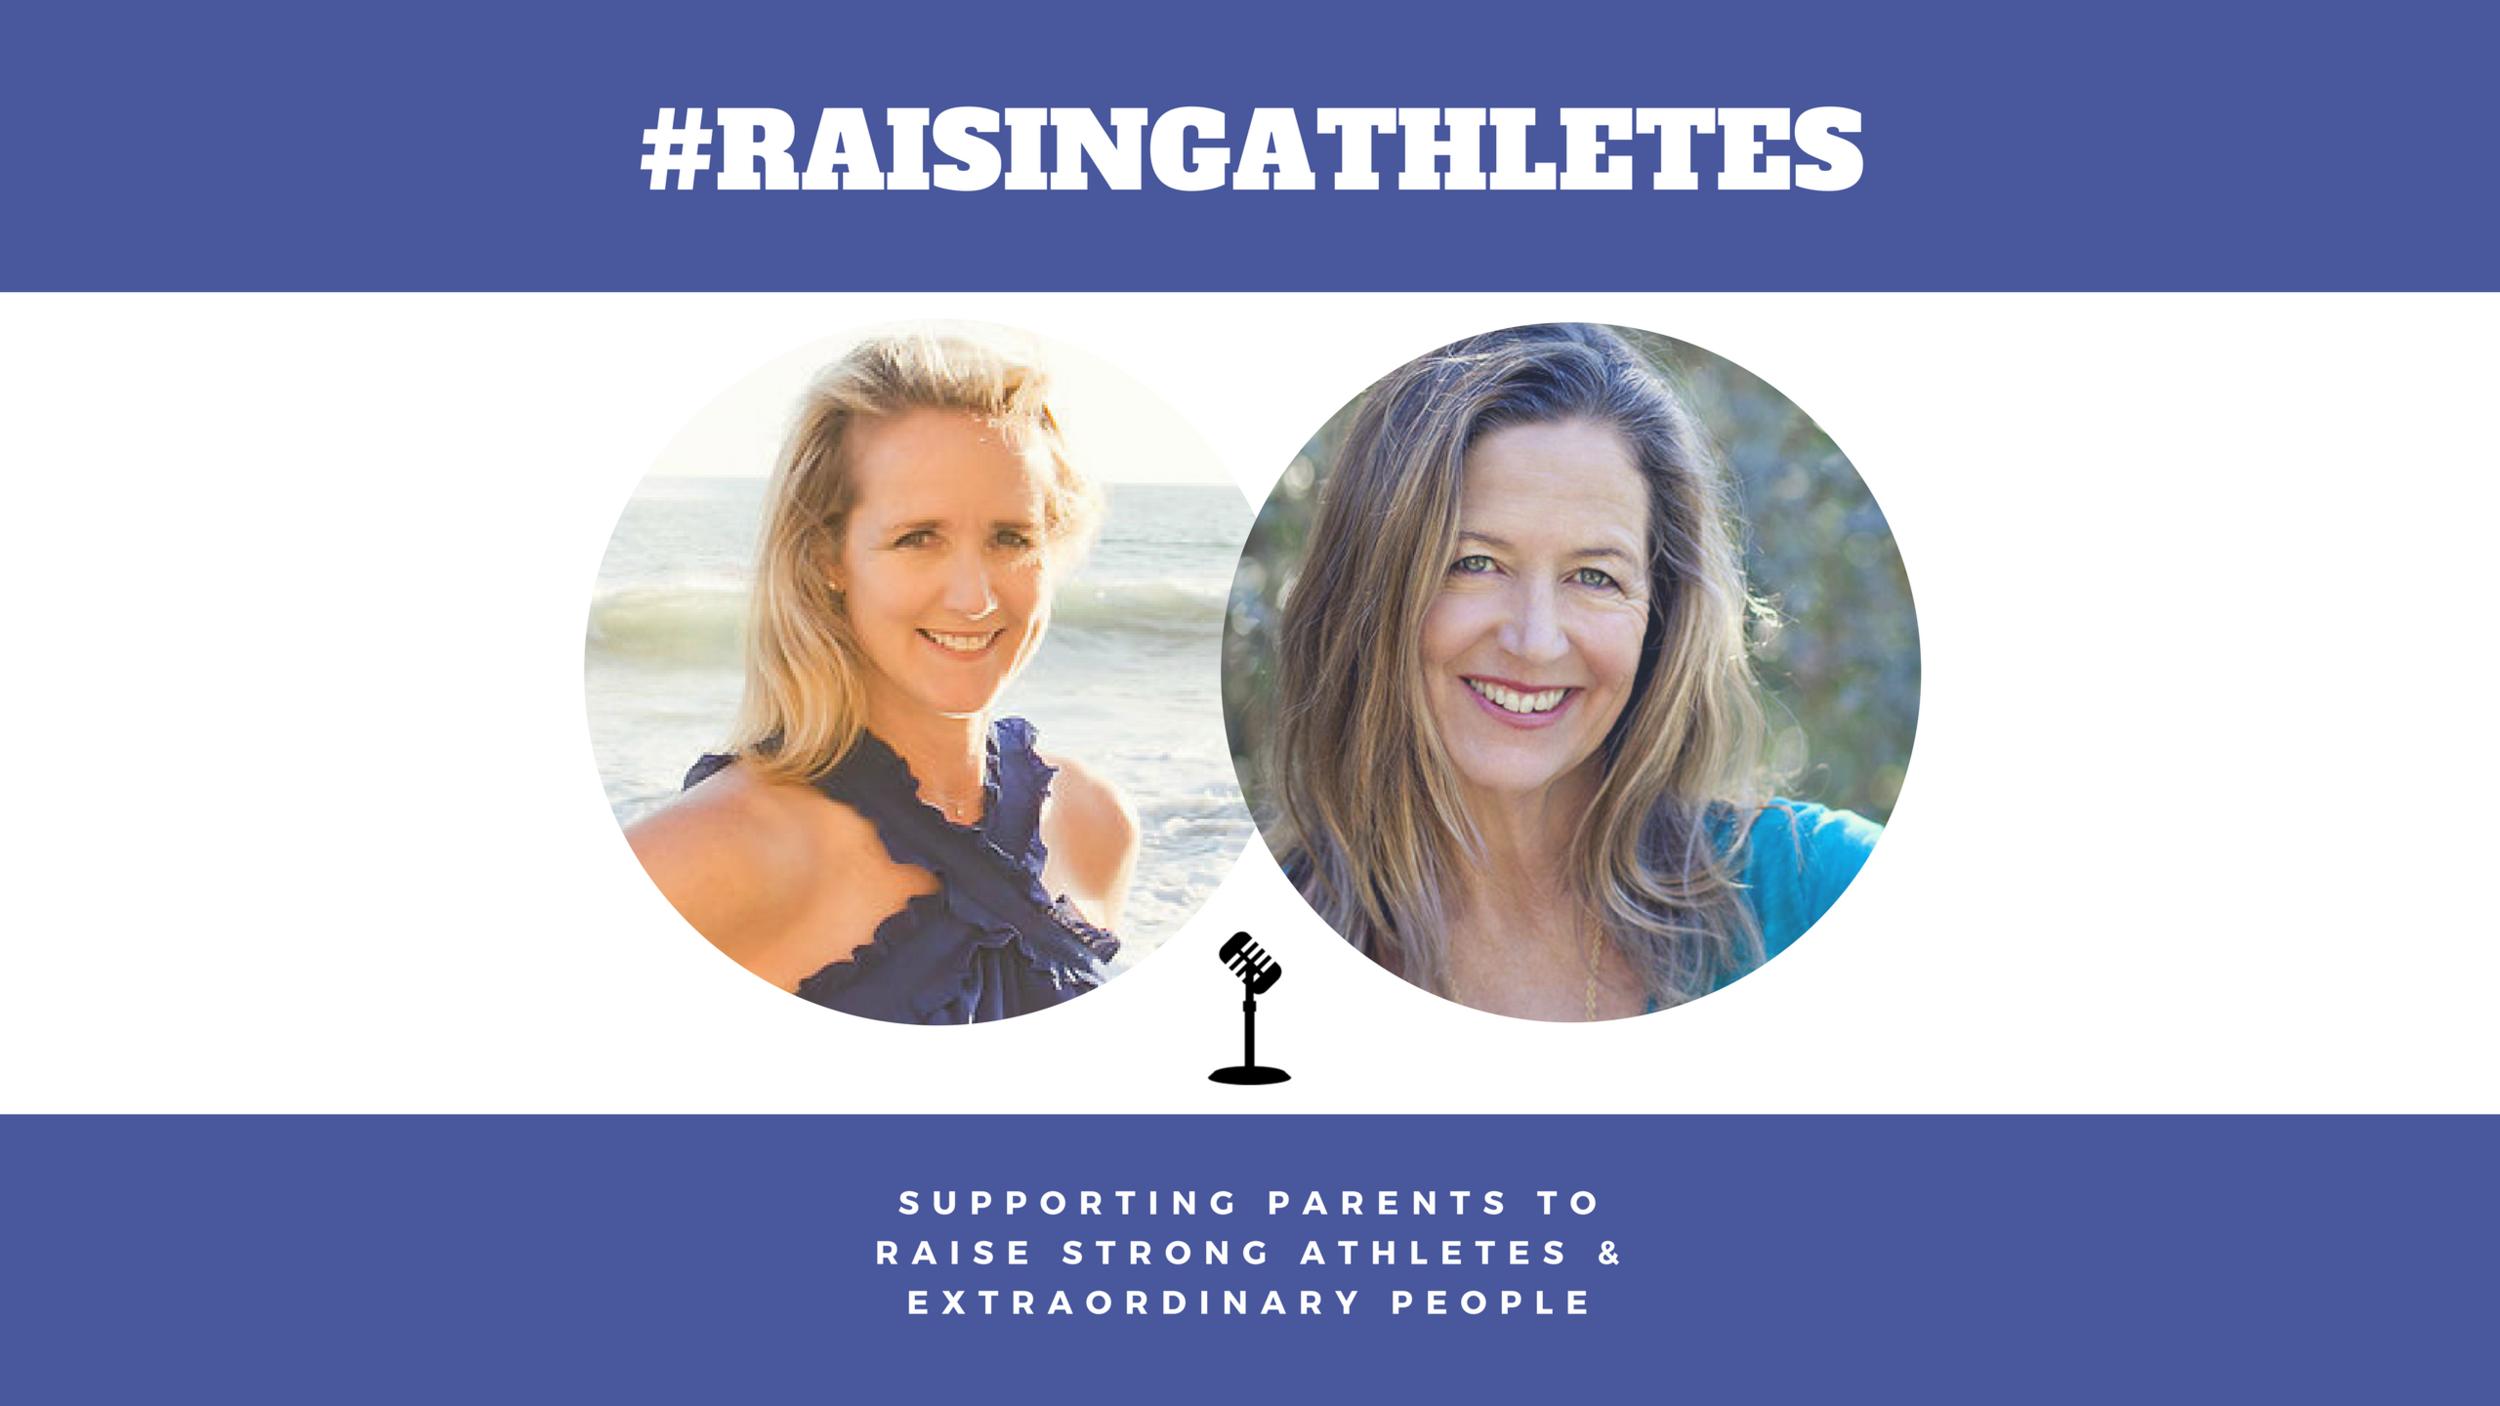 raisingathletes.png